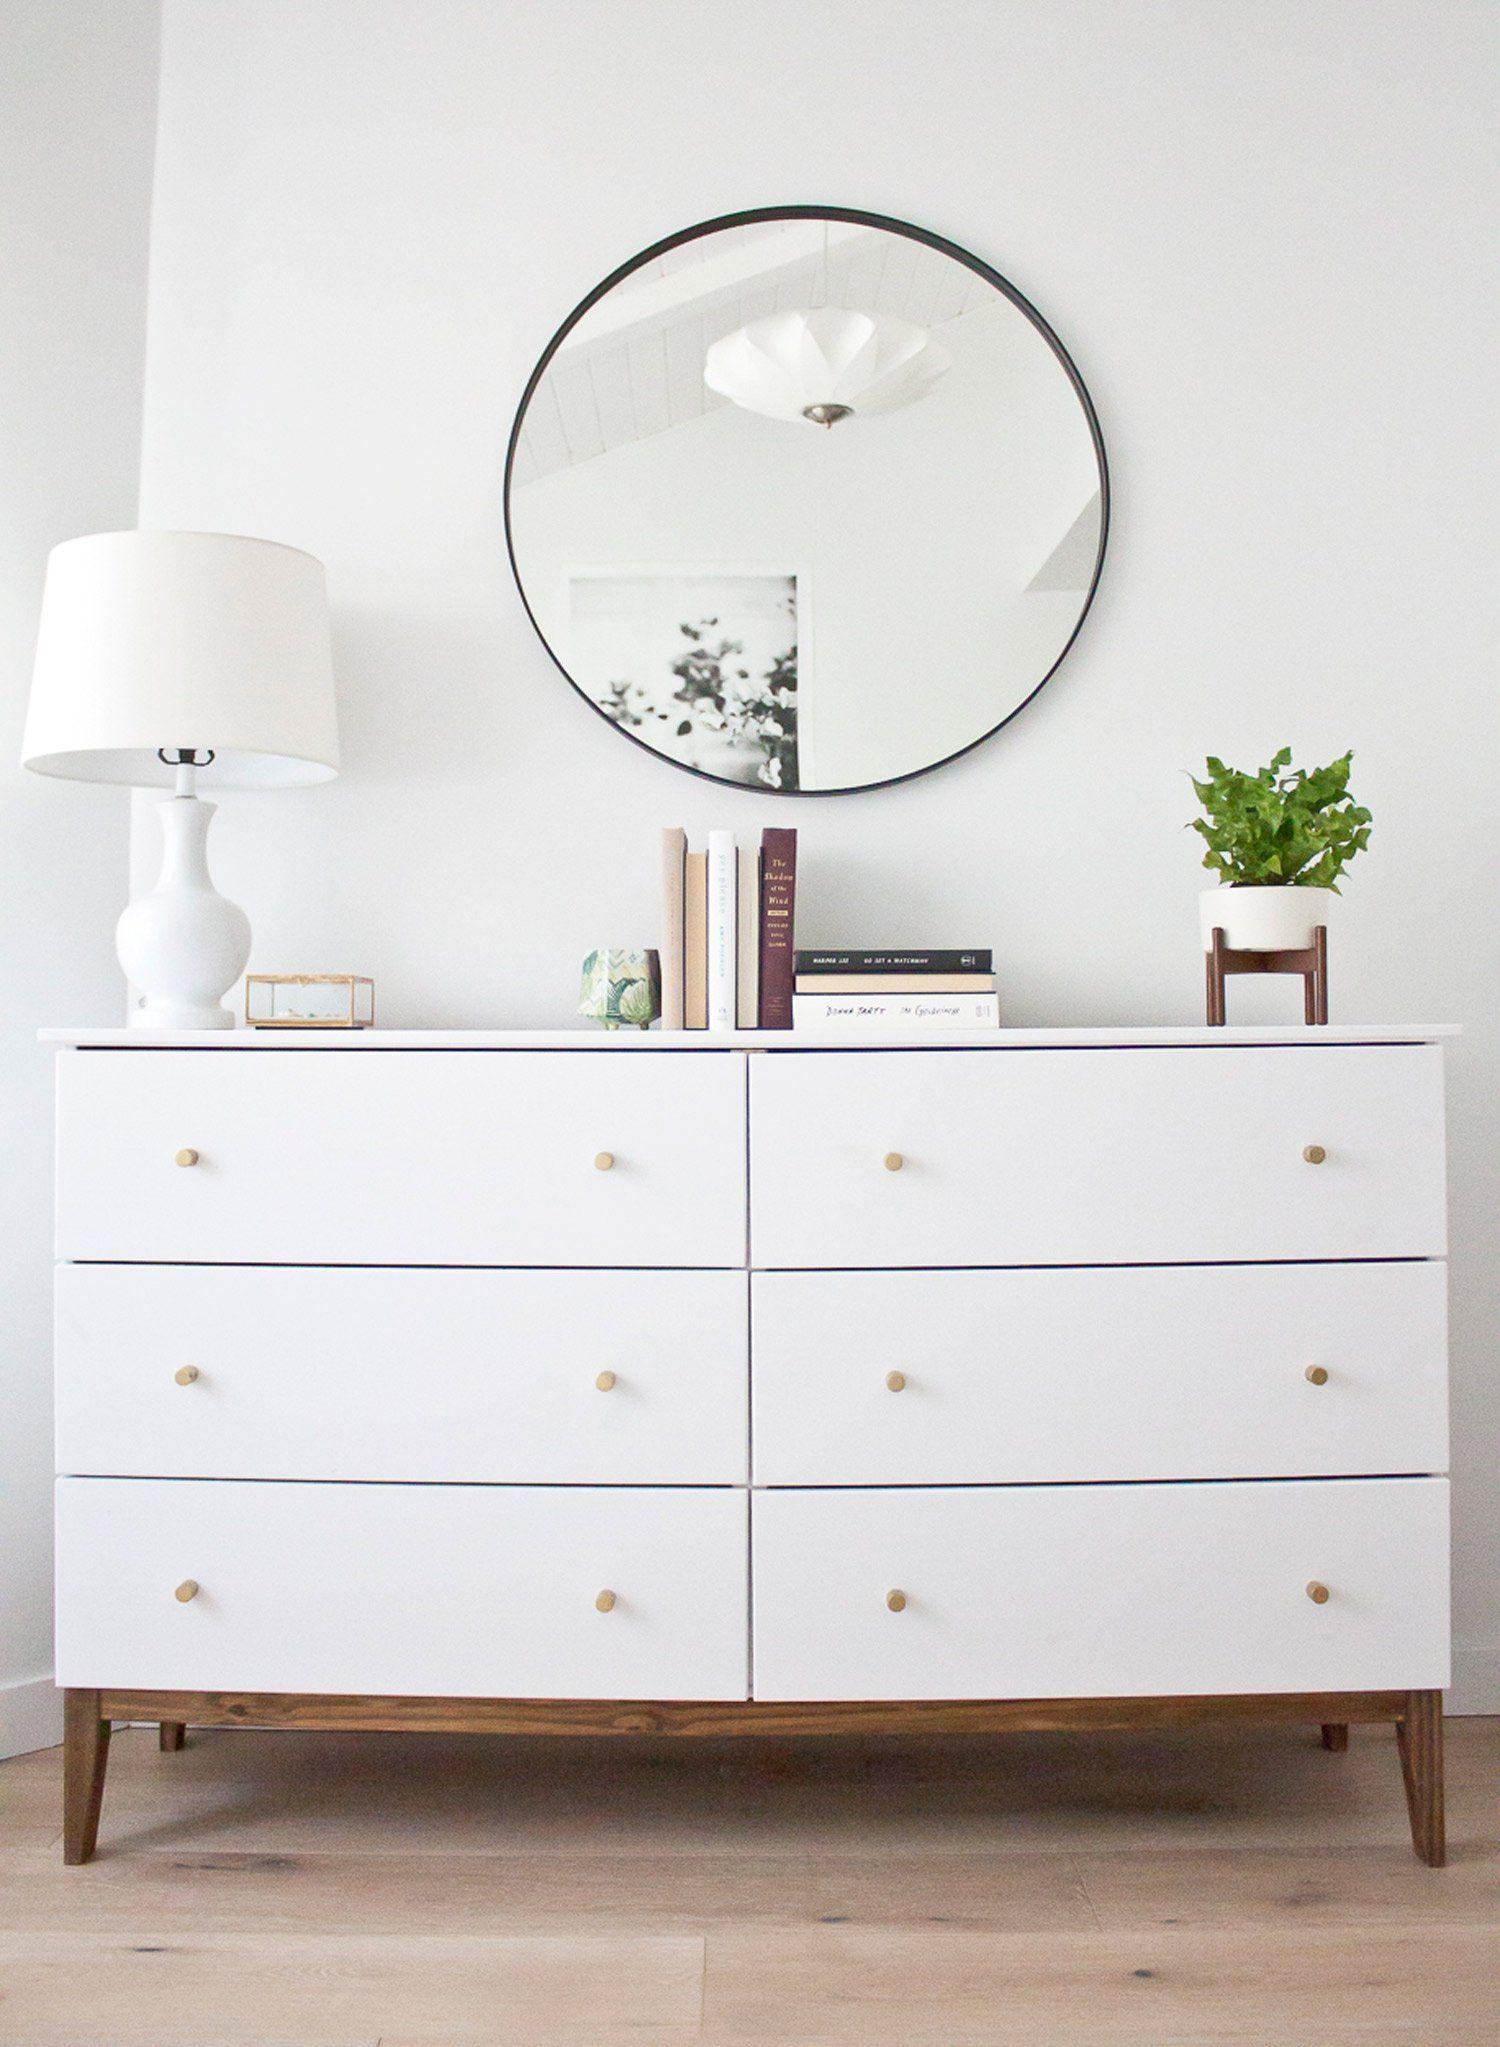 How to Make an Ikea Dresser Look Like a Midcentury Splurge ...